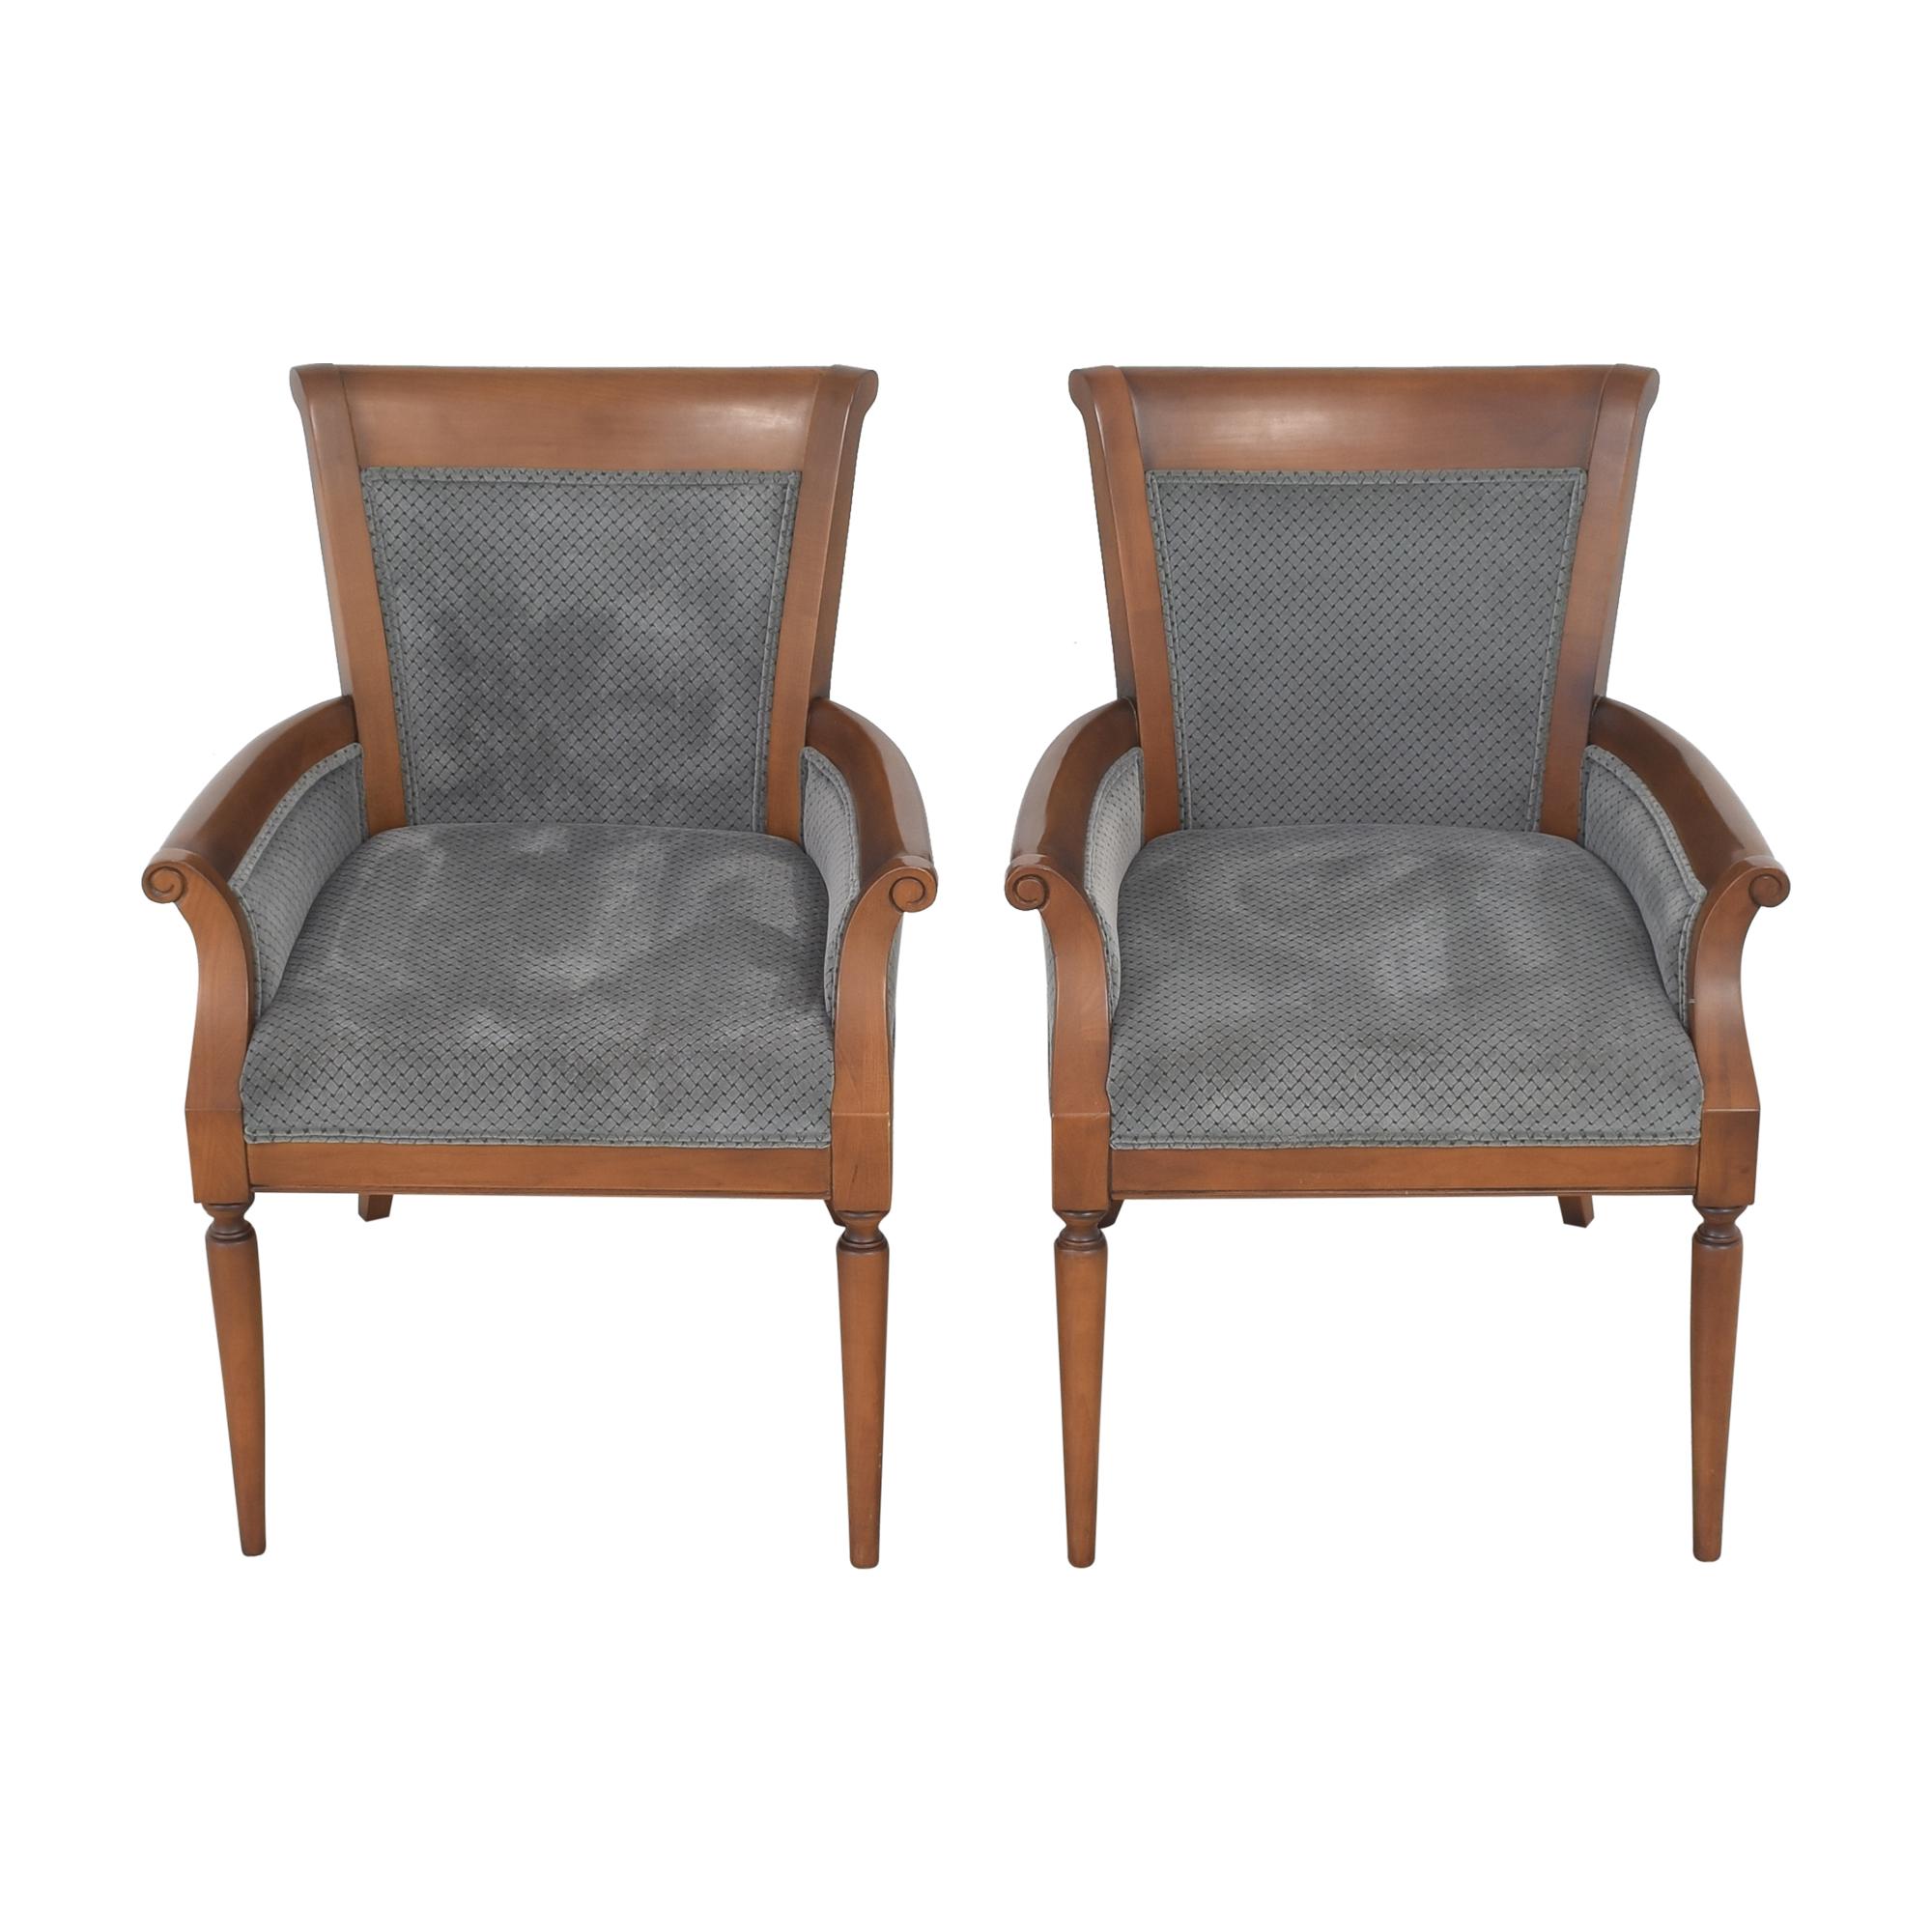 Hekman Furniture Hekman Aberdeen Accent Chairs discount